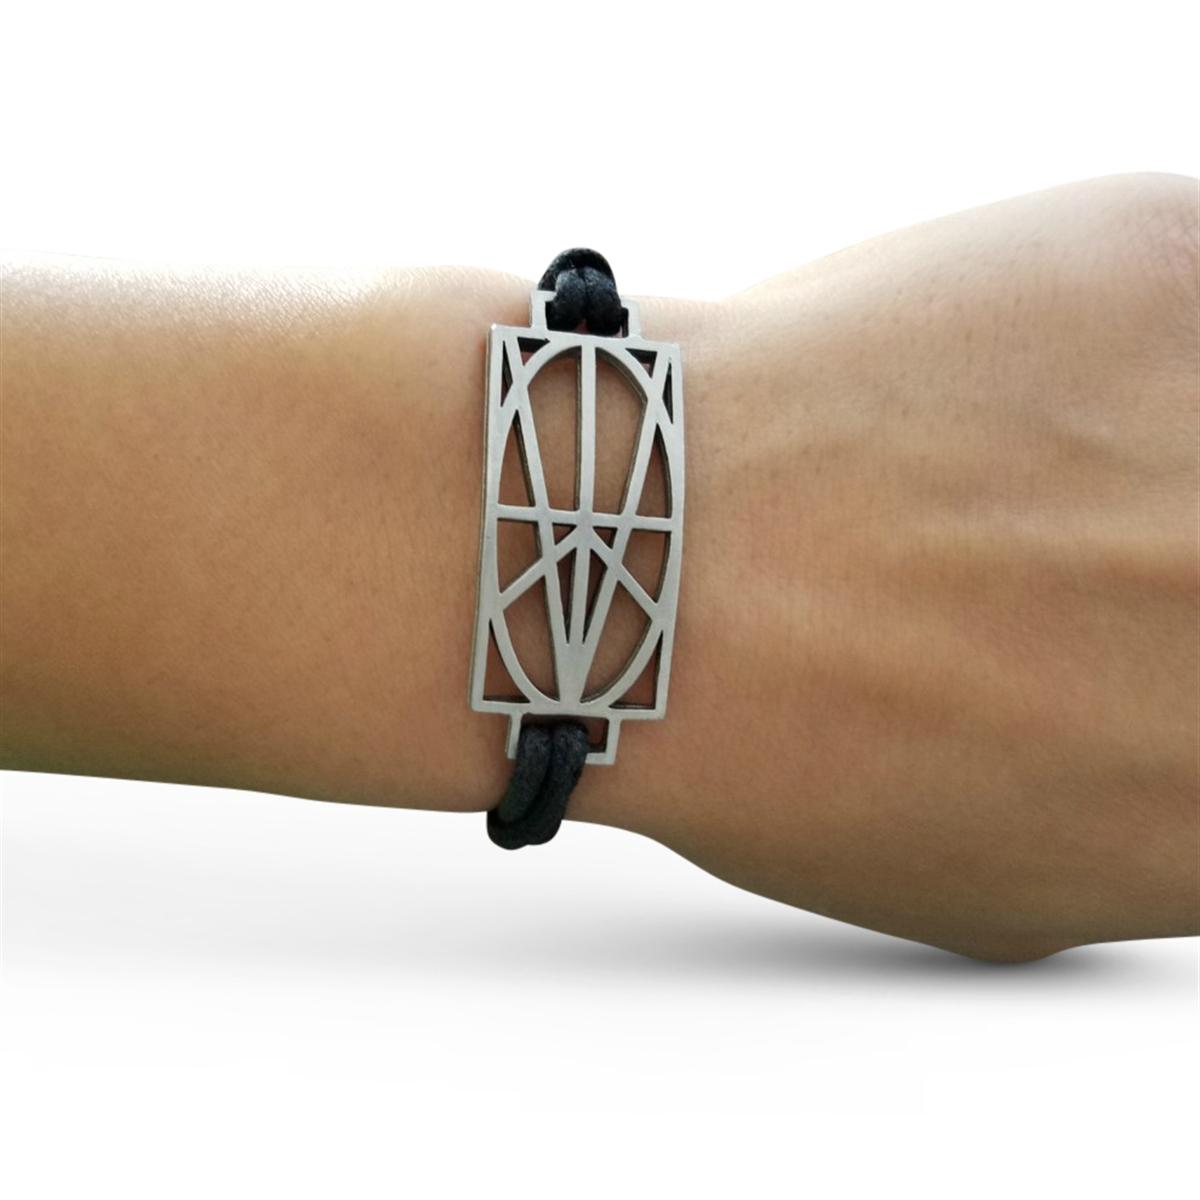 Picture of Women's Black Wrap & Tuck Bracelet - Large Zymbol